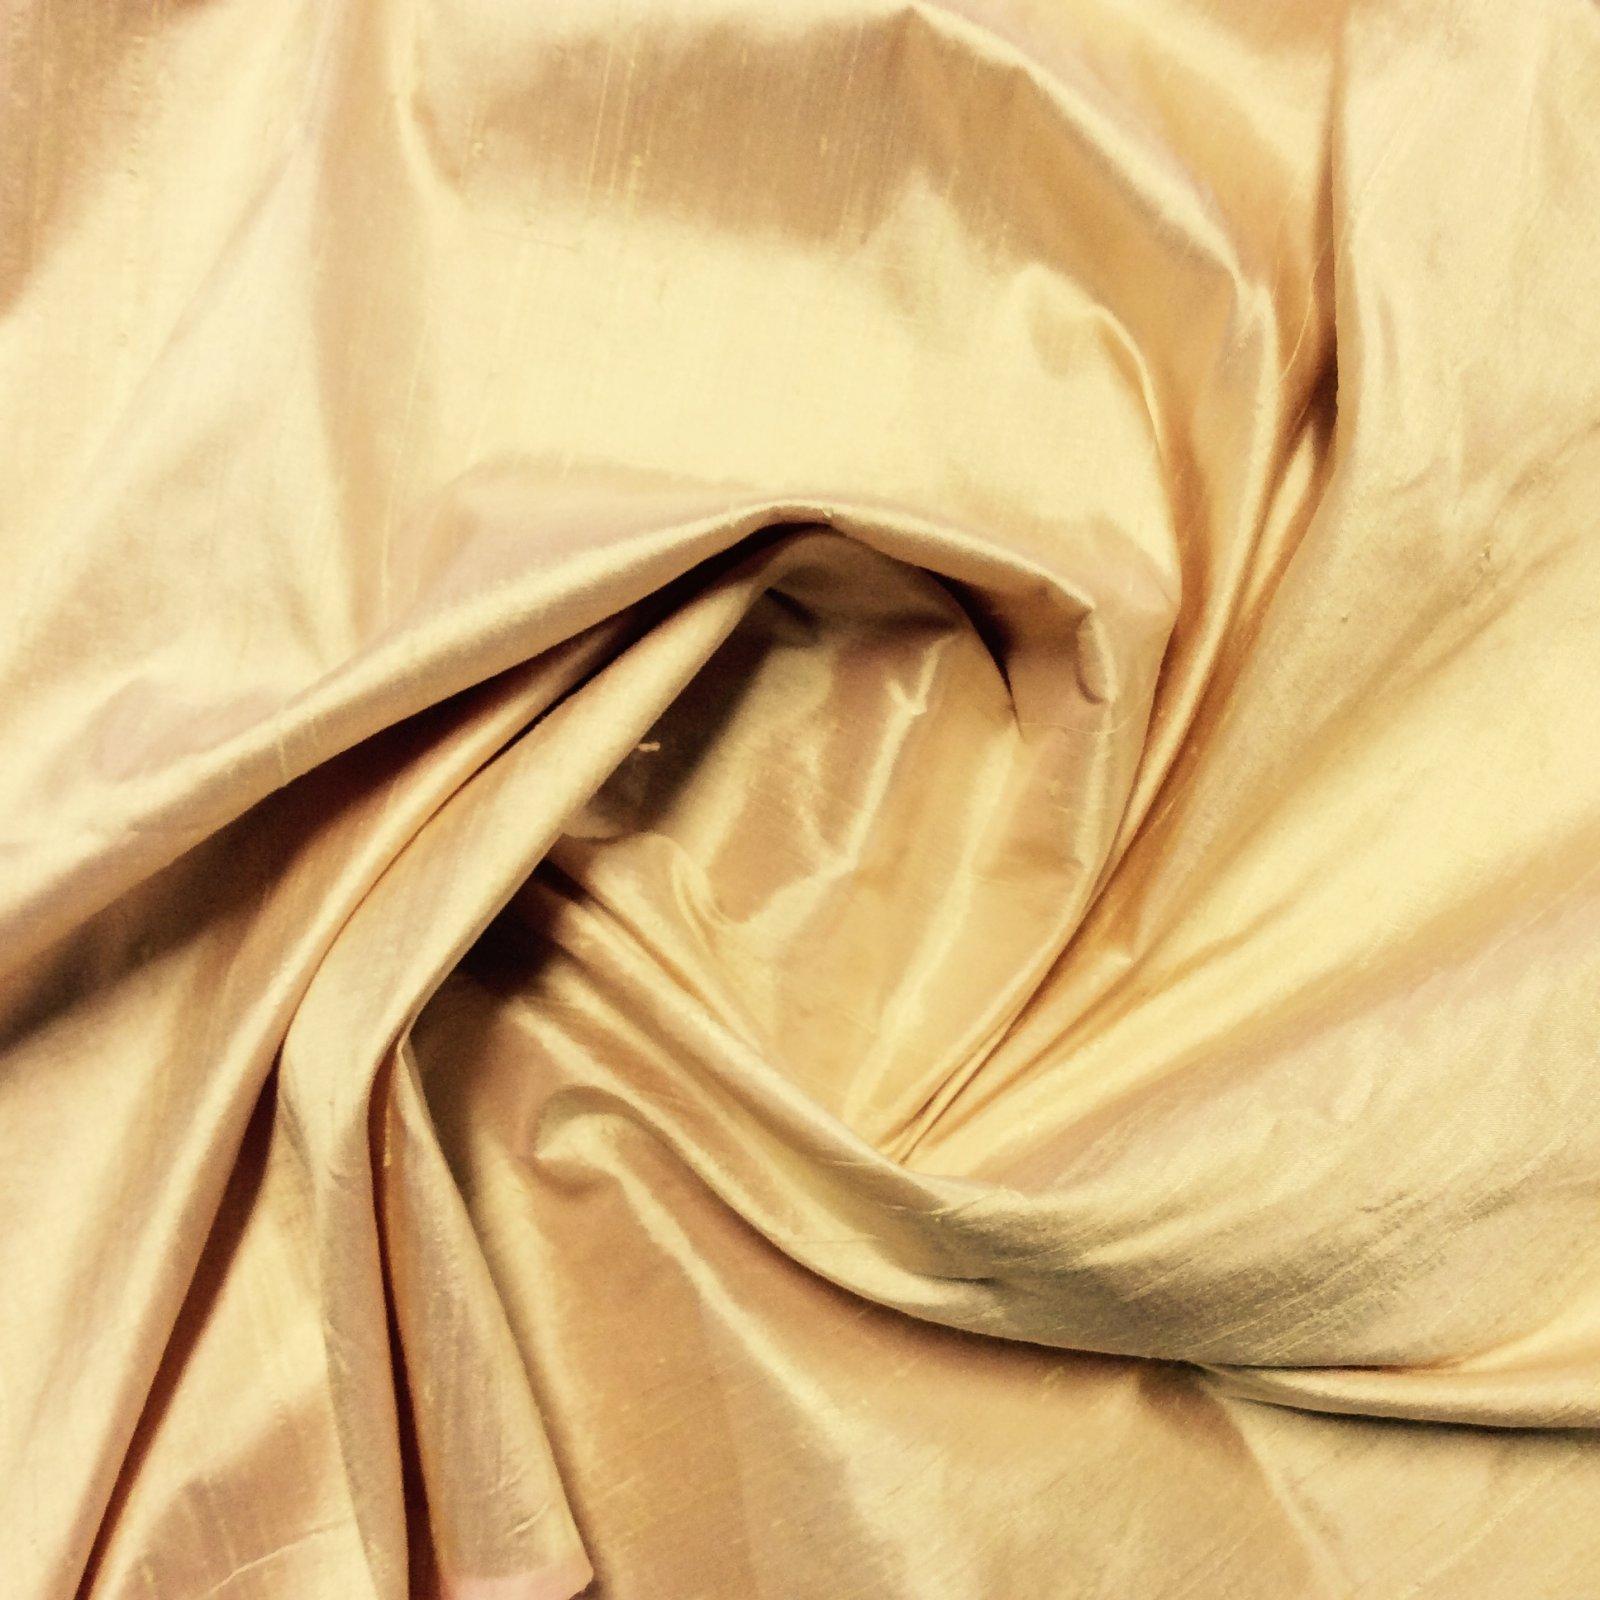 SILK Yellow Cream Peach Exquisite Hand Woven Dupioni 100% Silk Fabric Drapery By the Yard SH23